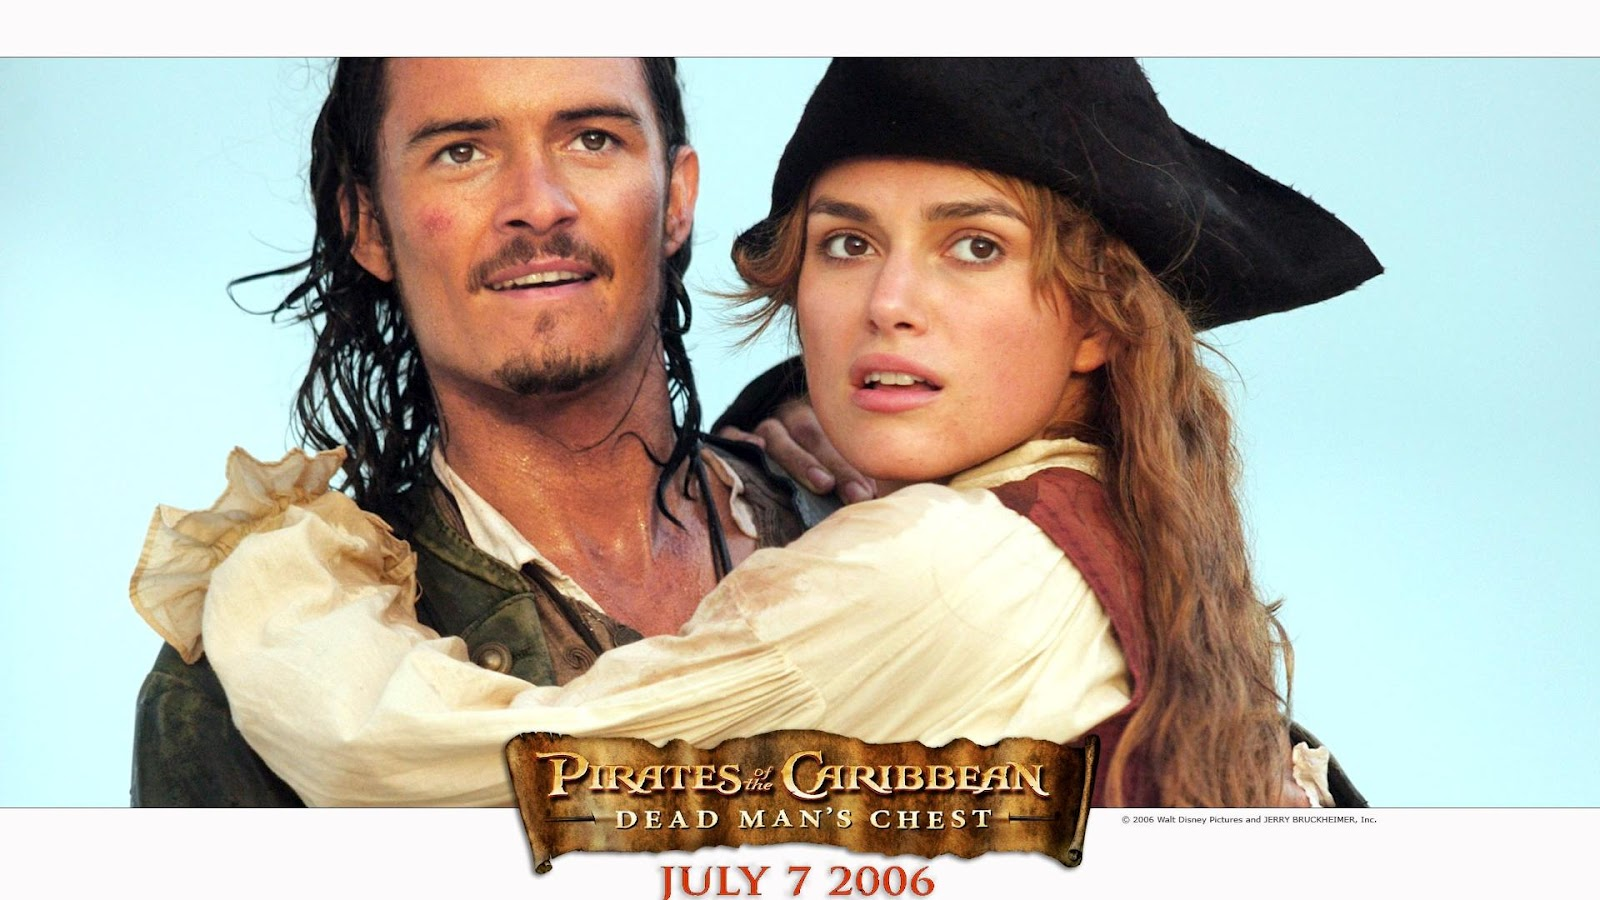 http://4.bp.blogspot.com/-dLT0X4eMdq4/UBHfGfcnm7I/AAAAAAAACQg/CE5pjX9MFR0/s1600/keira-knightley-dead-chest-caribbean-pirates-man-1080x1920.jpg